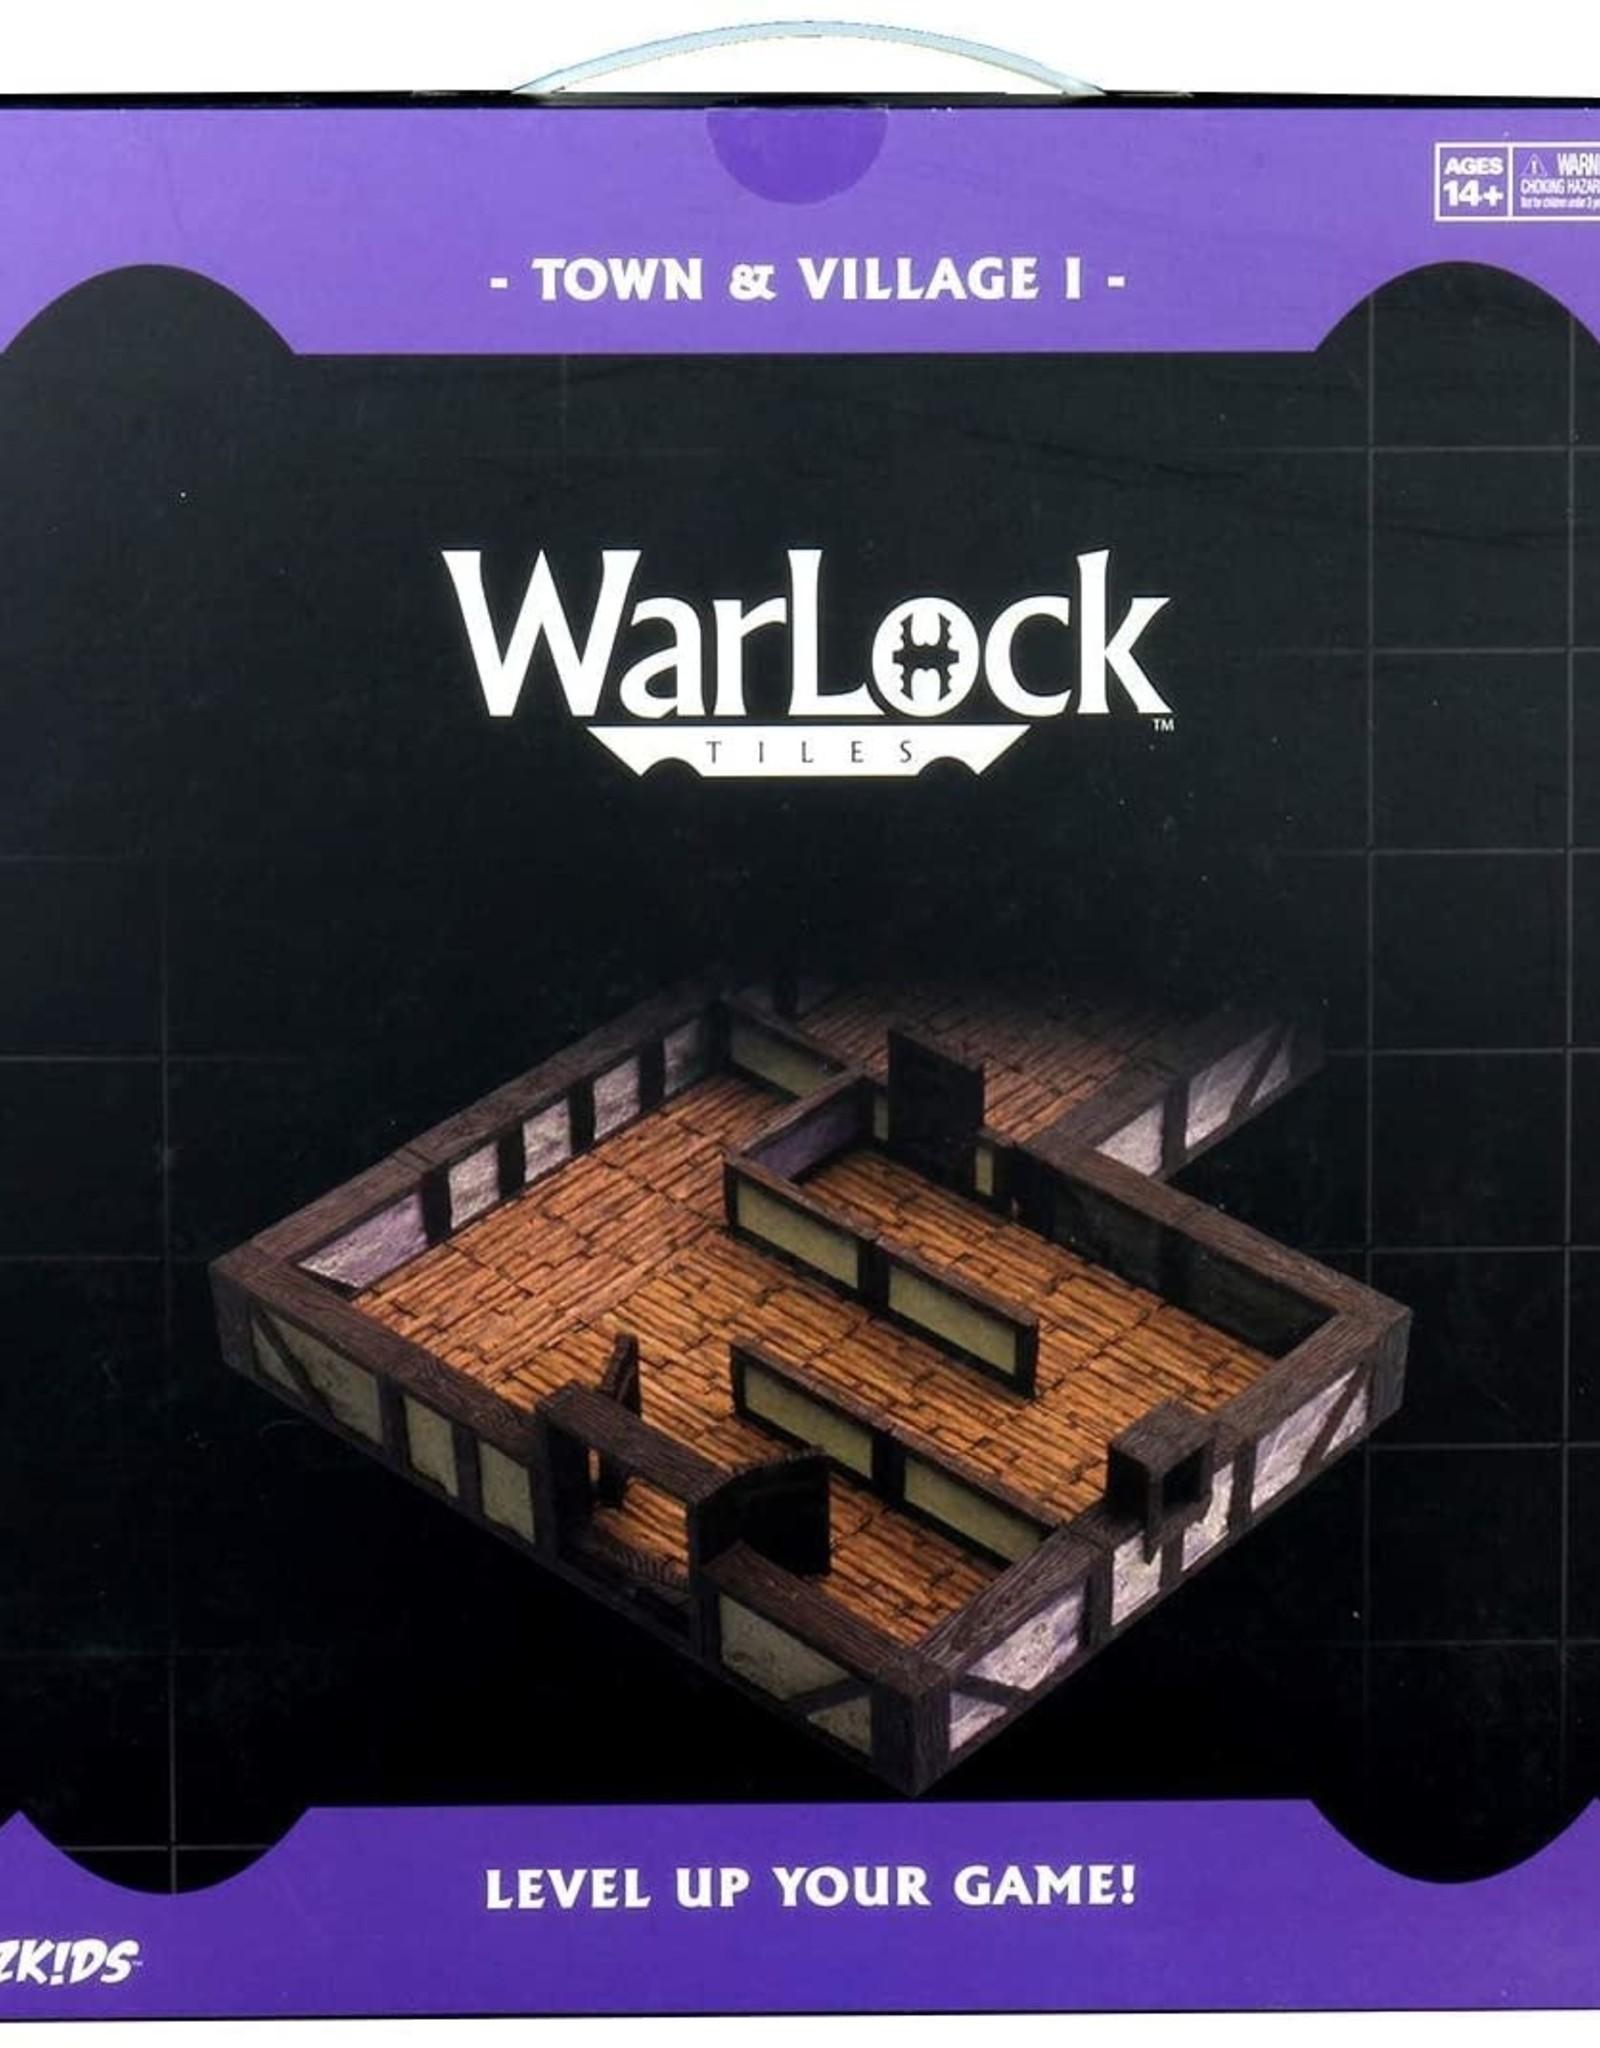 WarLock Tiles WarLock Tiles: Town & Village